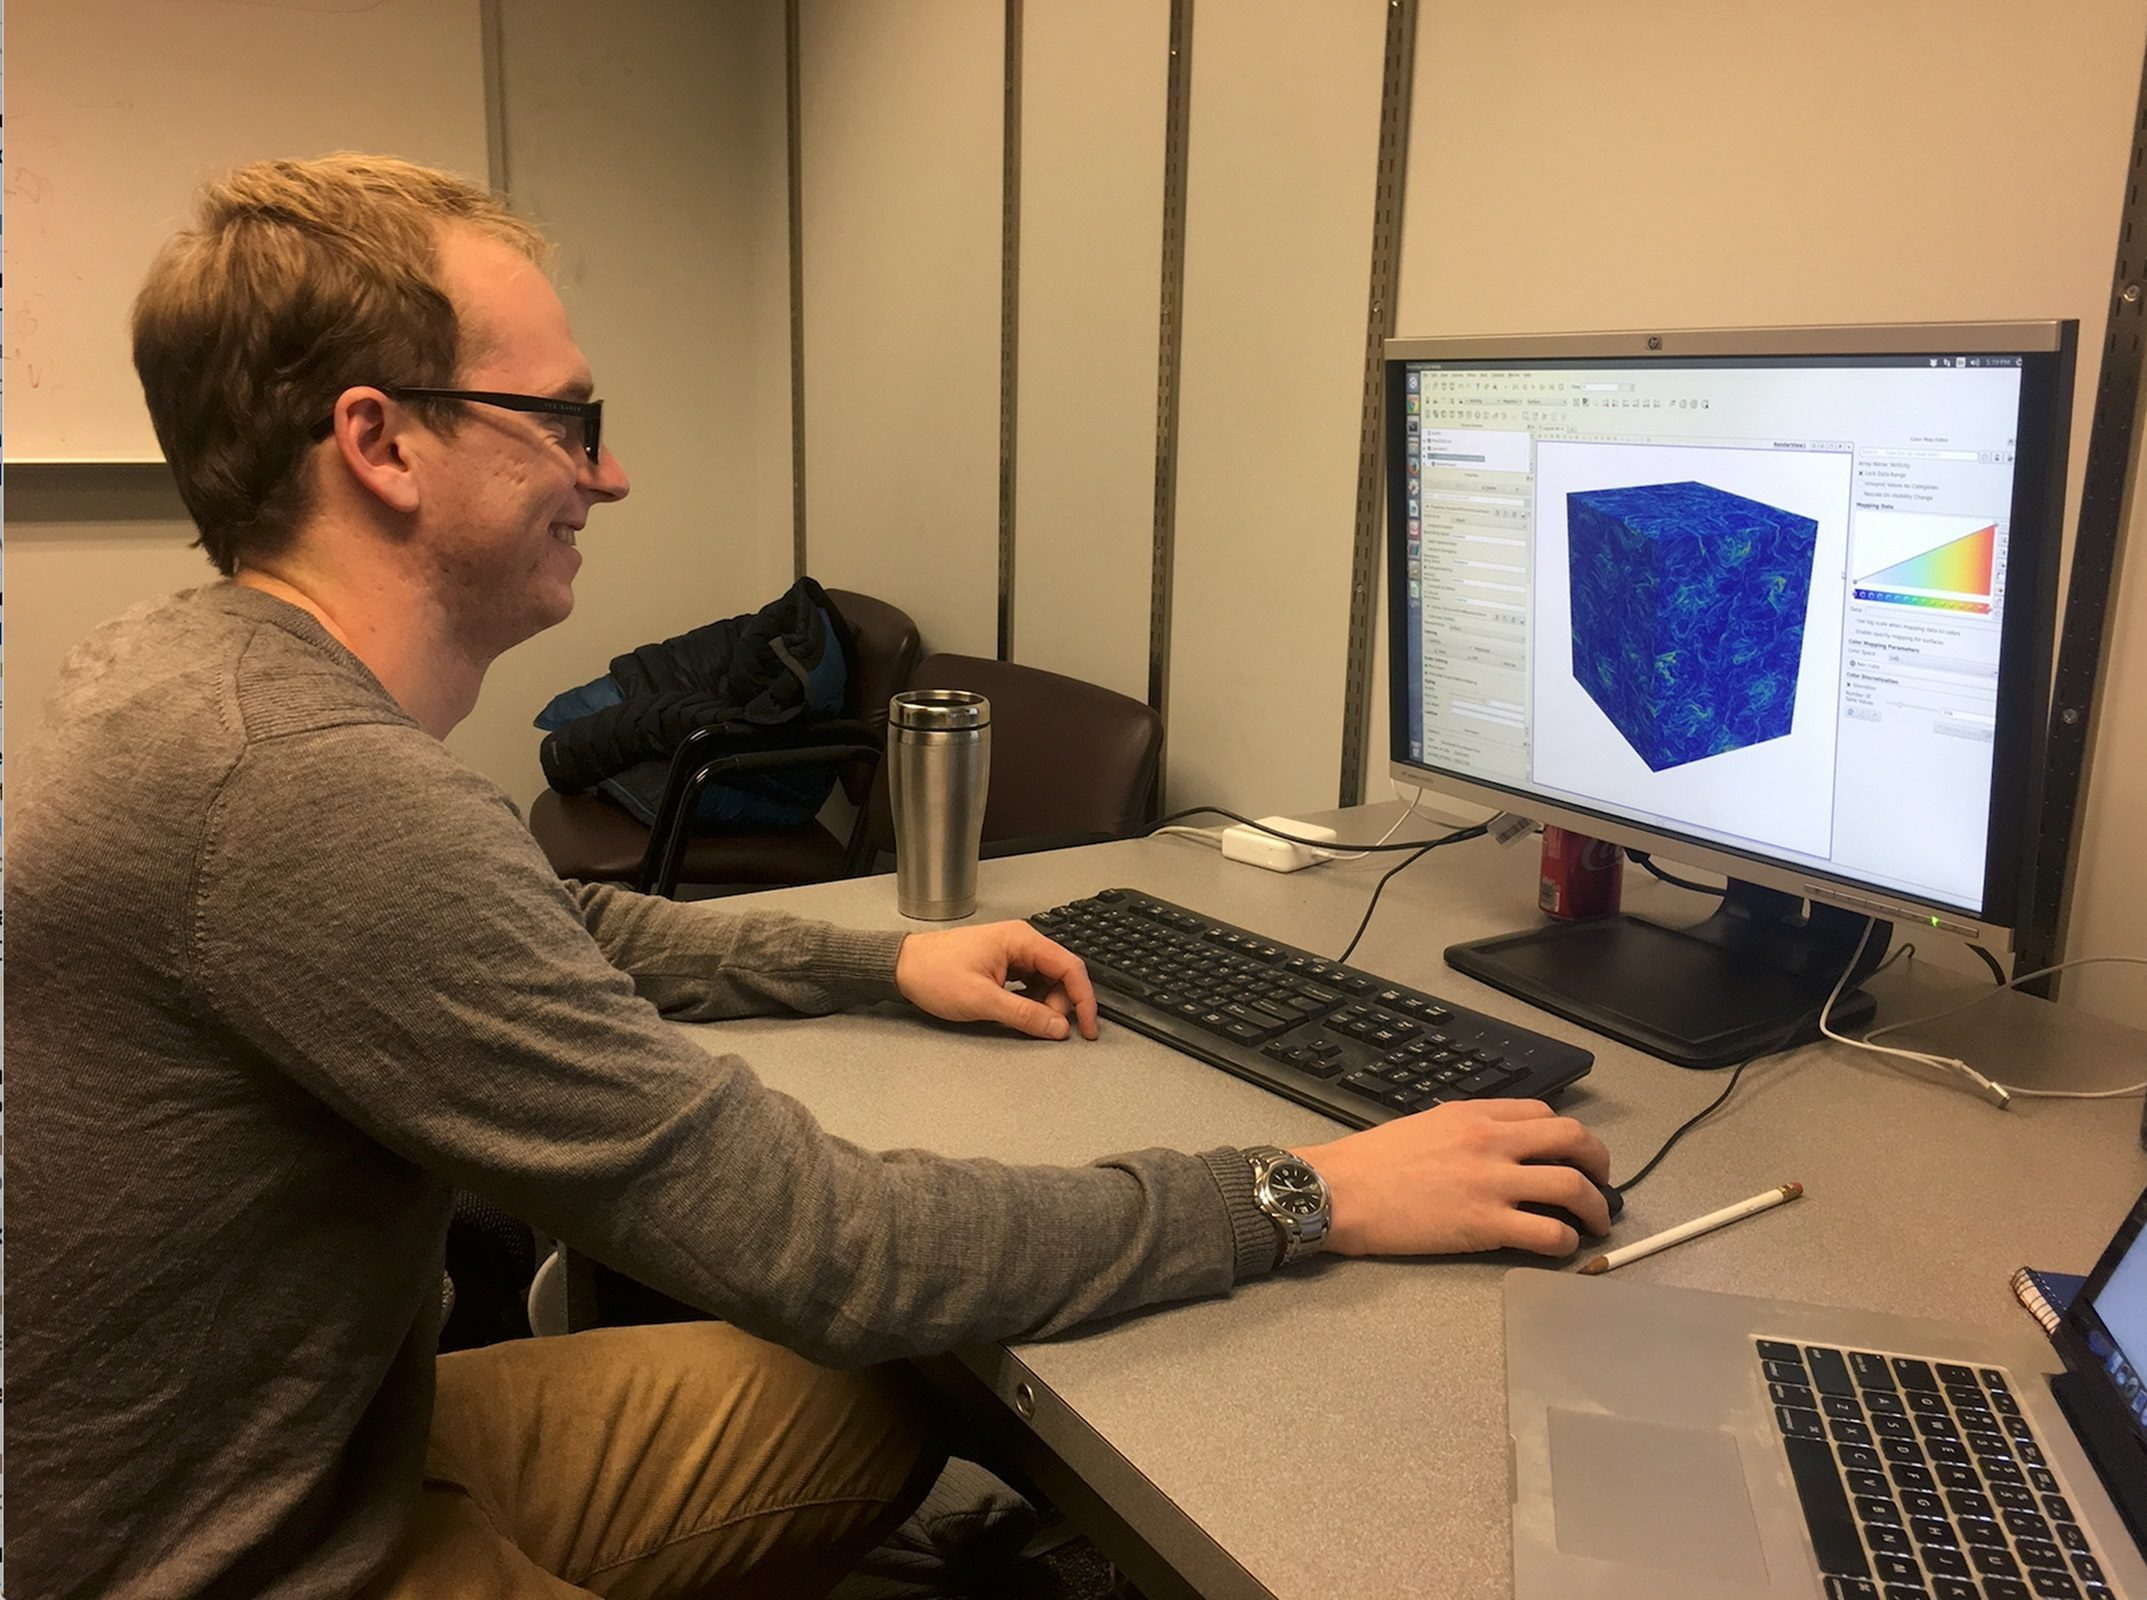 Ph.D. student Eric Parish working at a computer